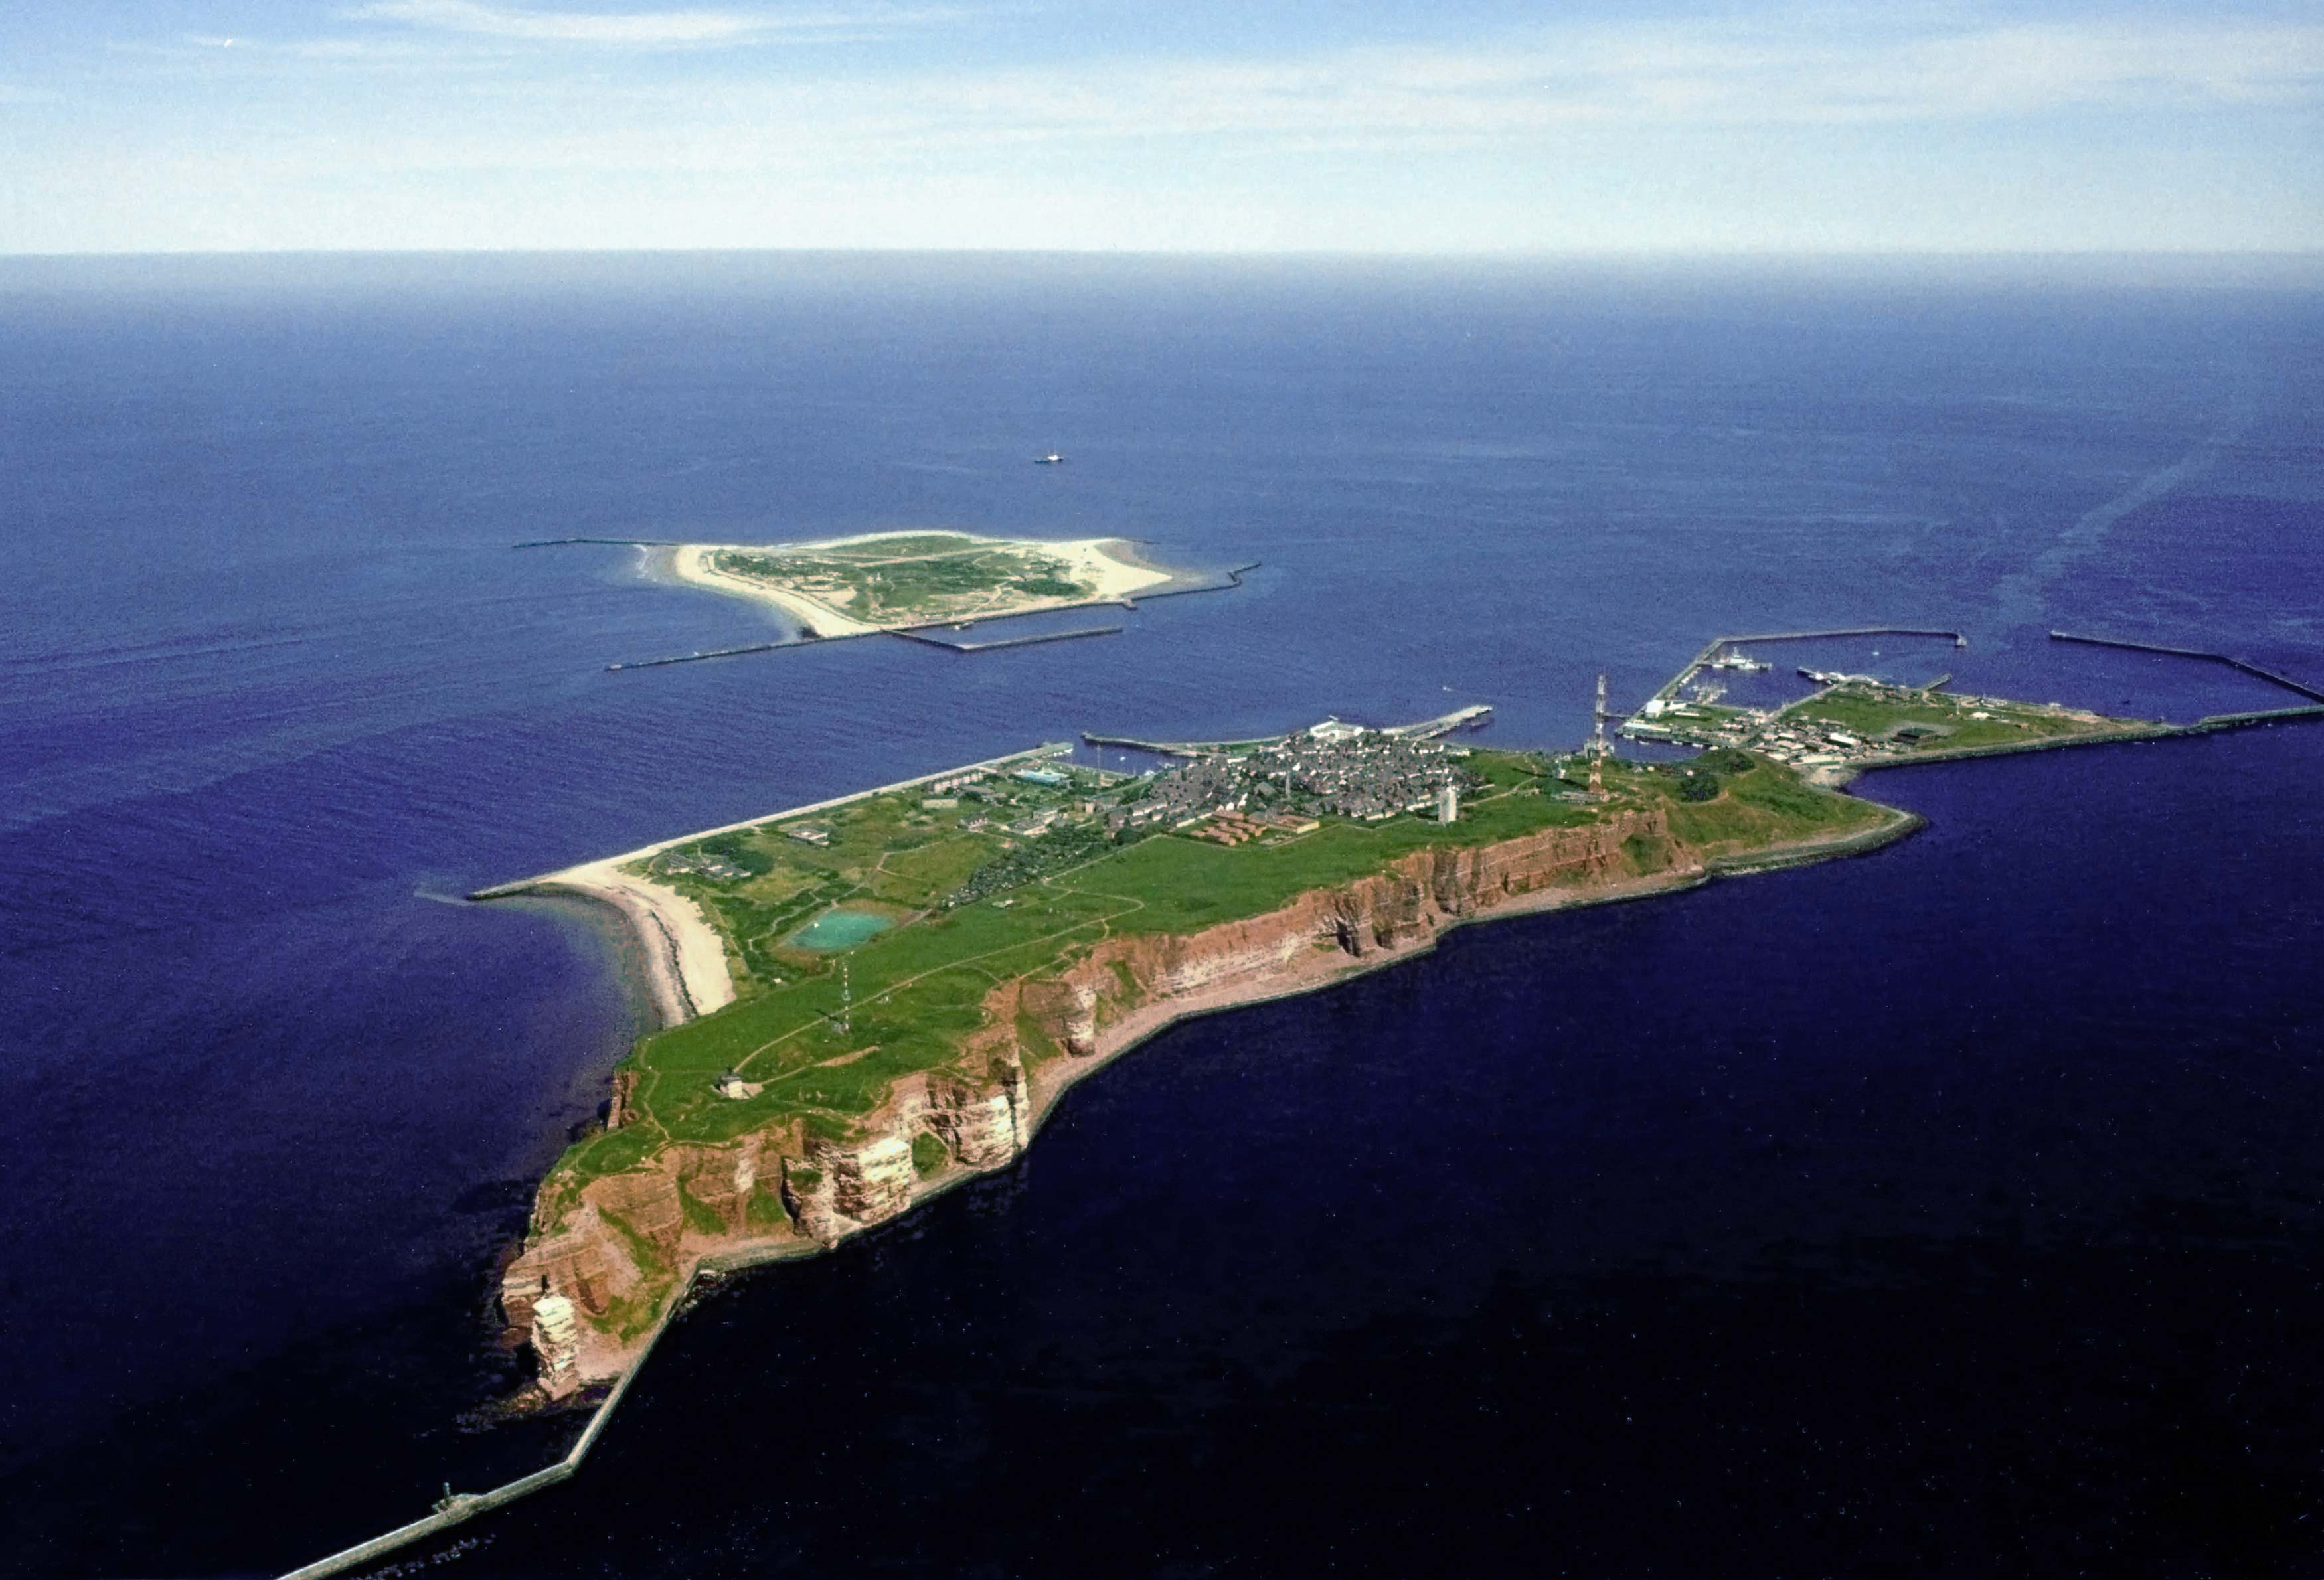 Ini Dia Pulau Yang Bertahan Dari Ledakan Non Nuklir Terbesar Di Dunia